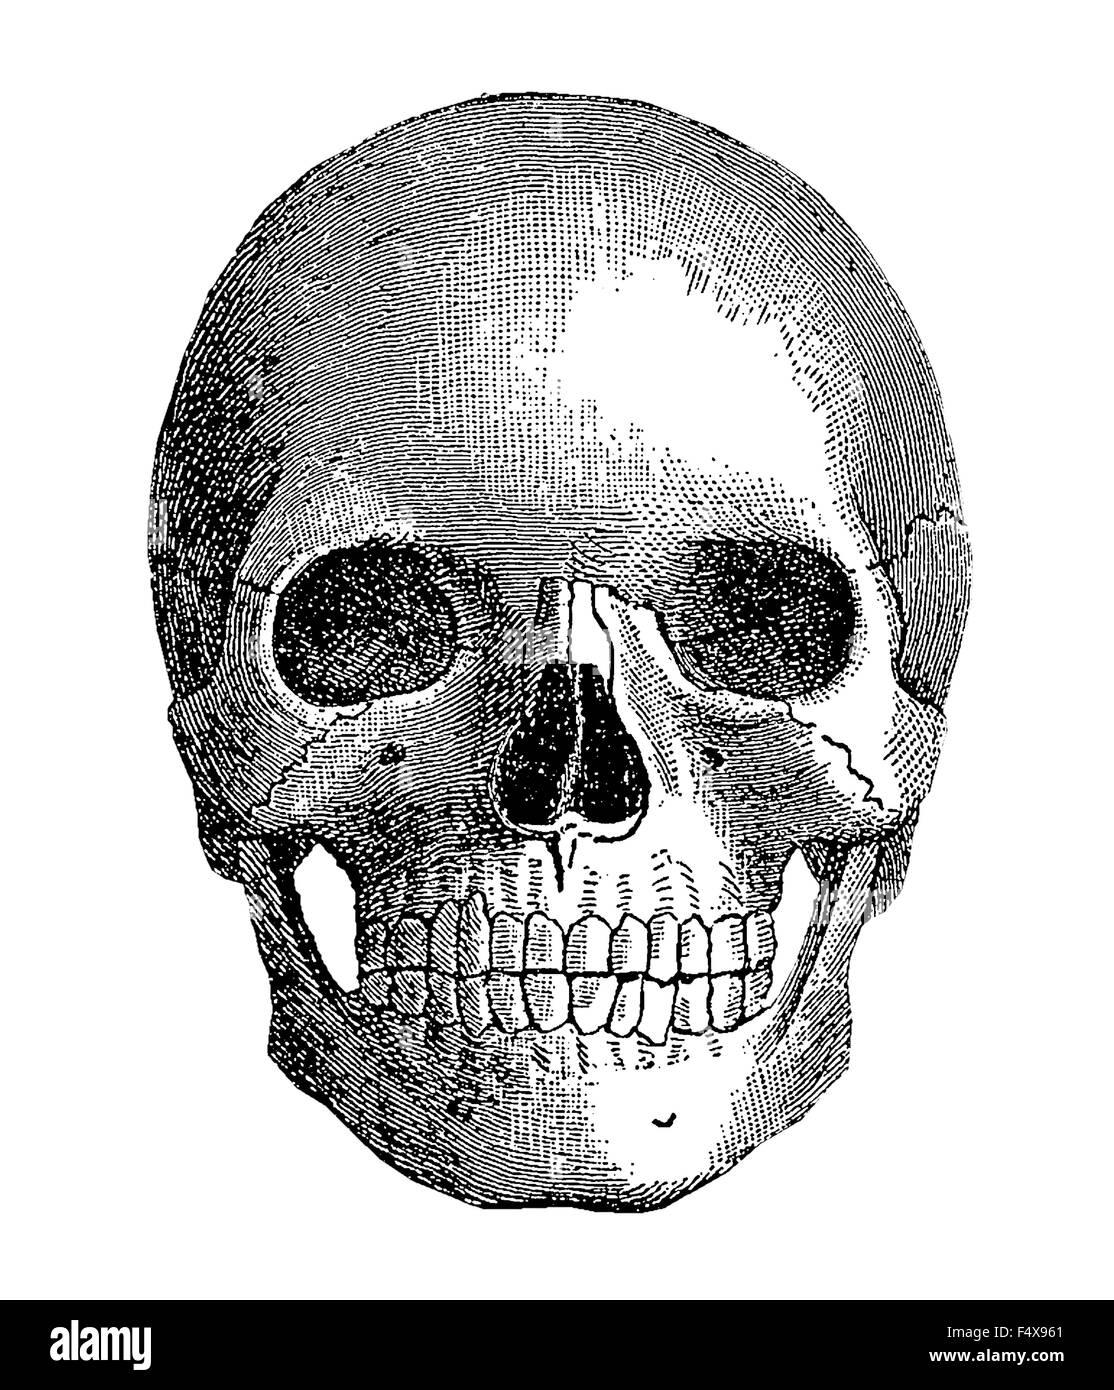 Miifotos Vintage Anatomia Humana Completo Cráneo Wwwmiifotoscom